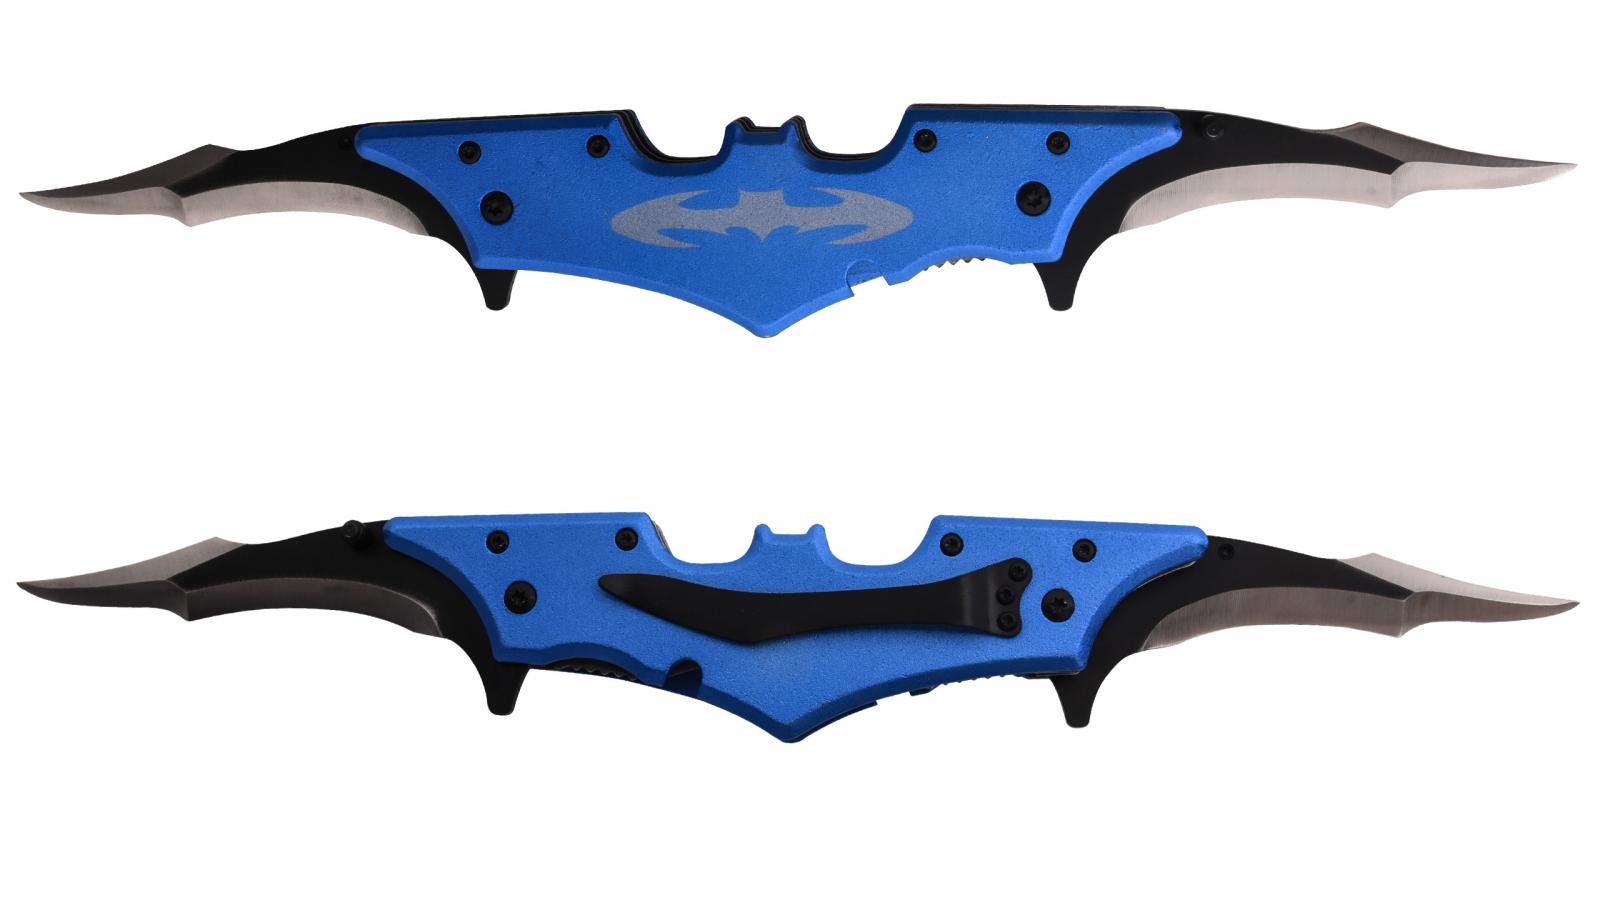 Карманный нож Бэтмена с двумя лезвиями